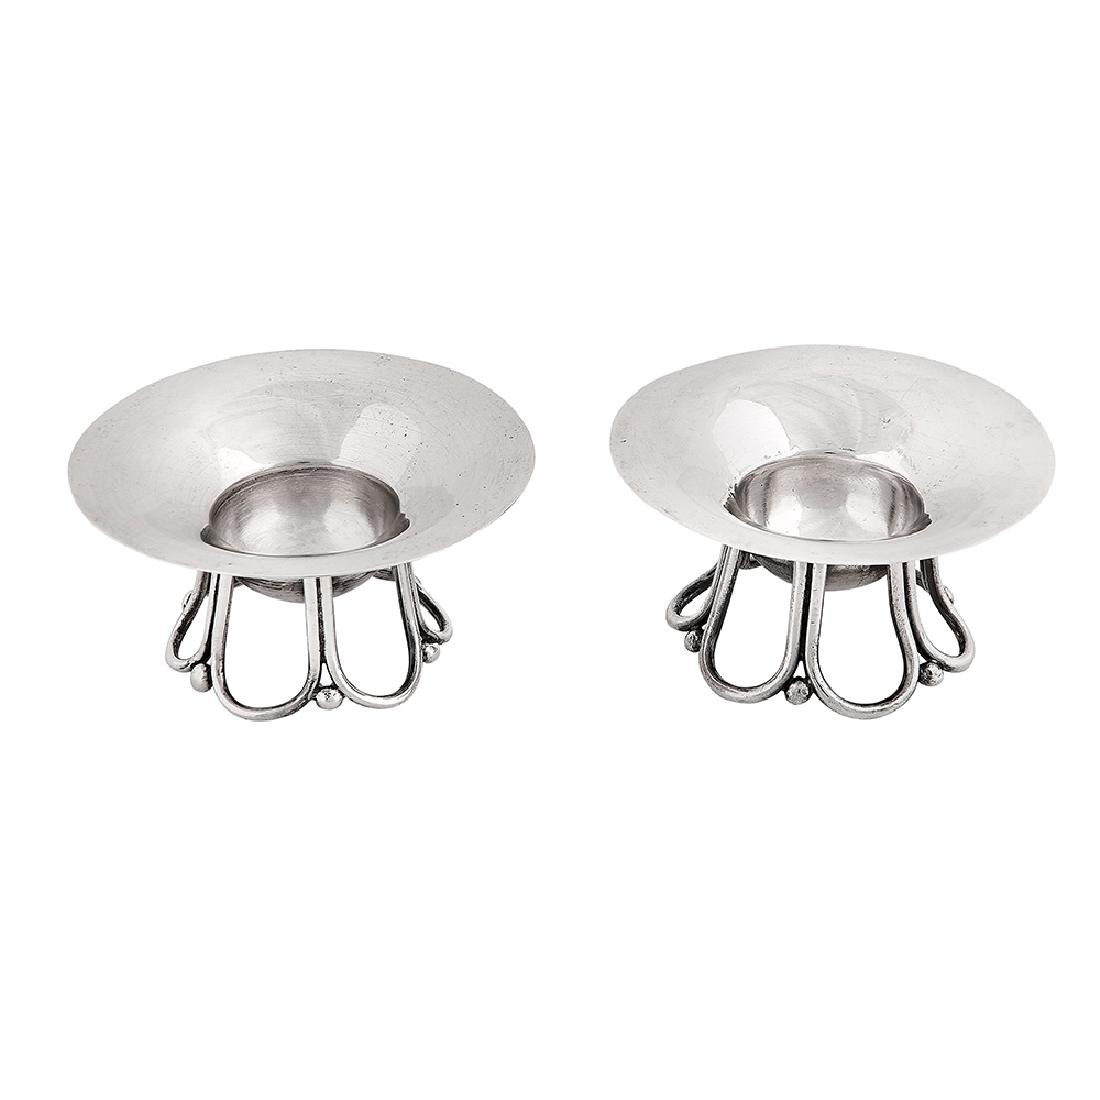 William Spratling (1900-1967) small bowls, pair